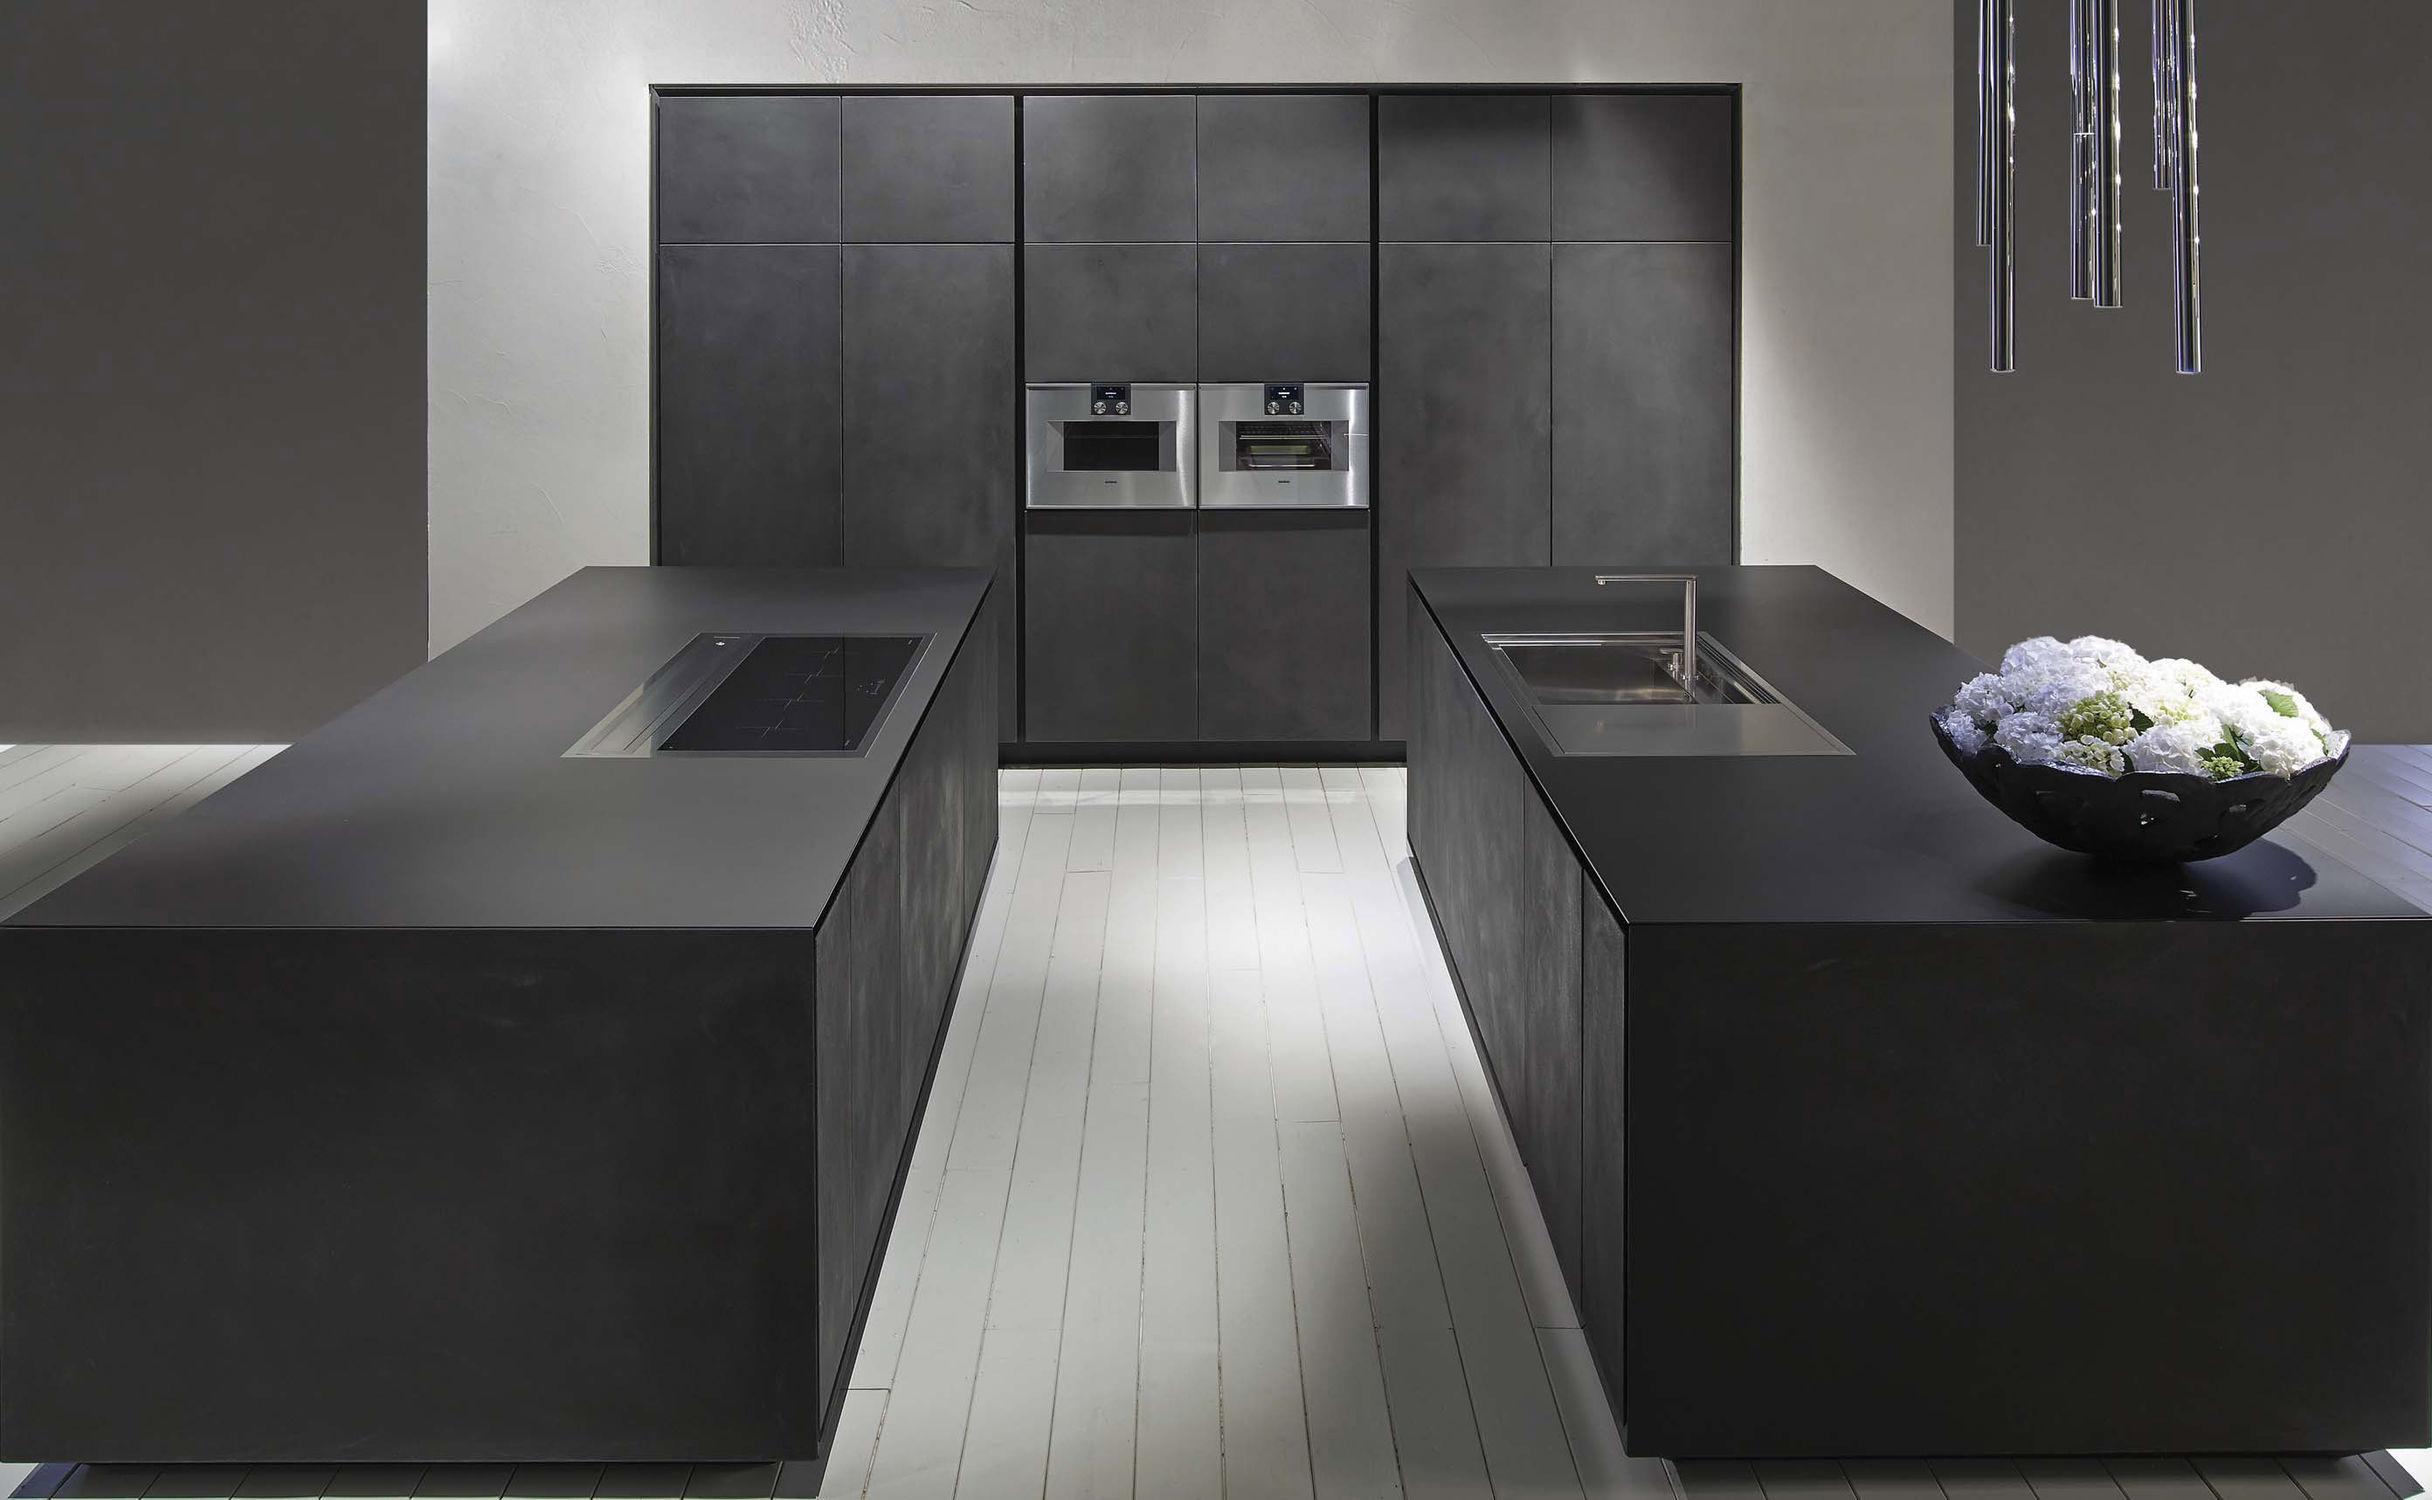 moderne kuche mit kochinsel, moderne küche / beton / kochinsel / lackiert - one - ri.fra mobili, Design ideen